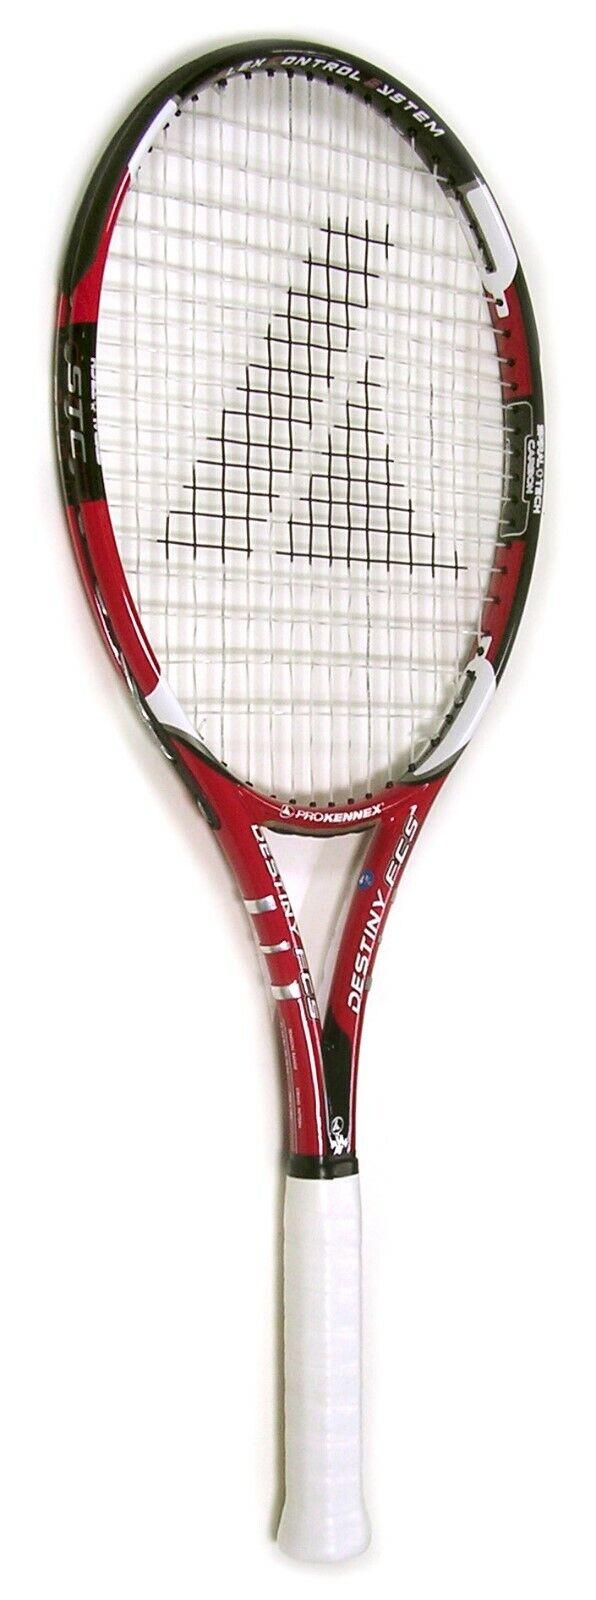 Pro Kennex Destiny Flex Control Graphite Tennis Racket - Grip Size: 3 (3/8)